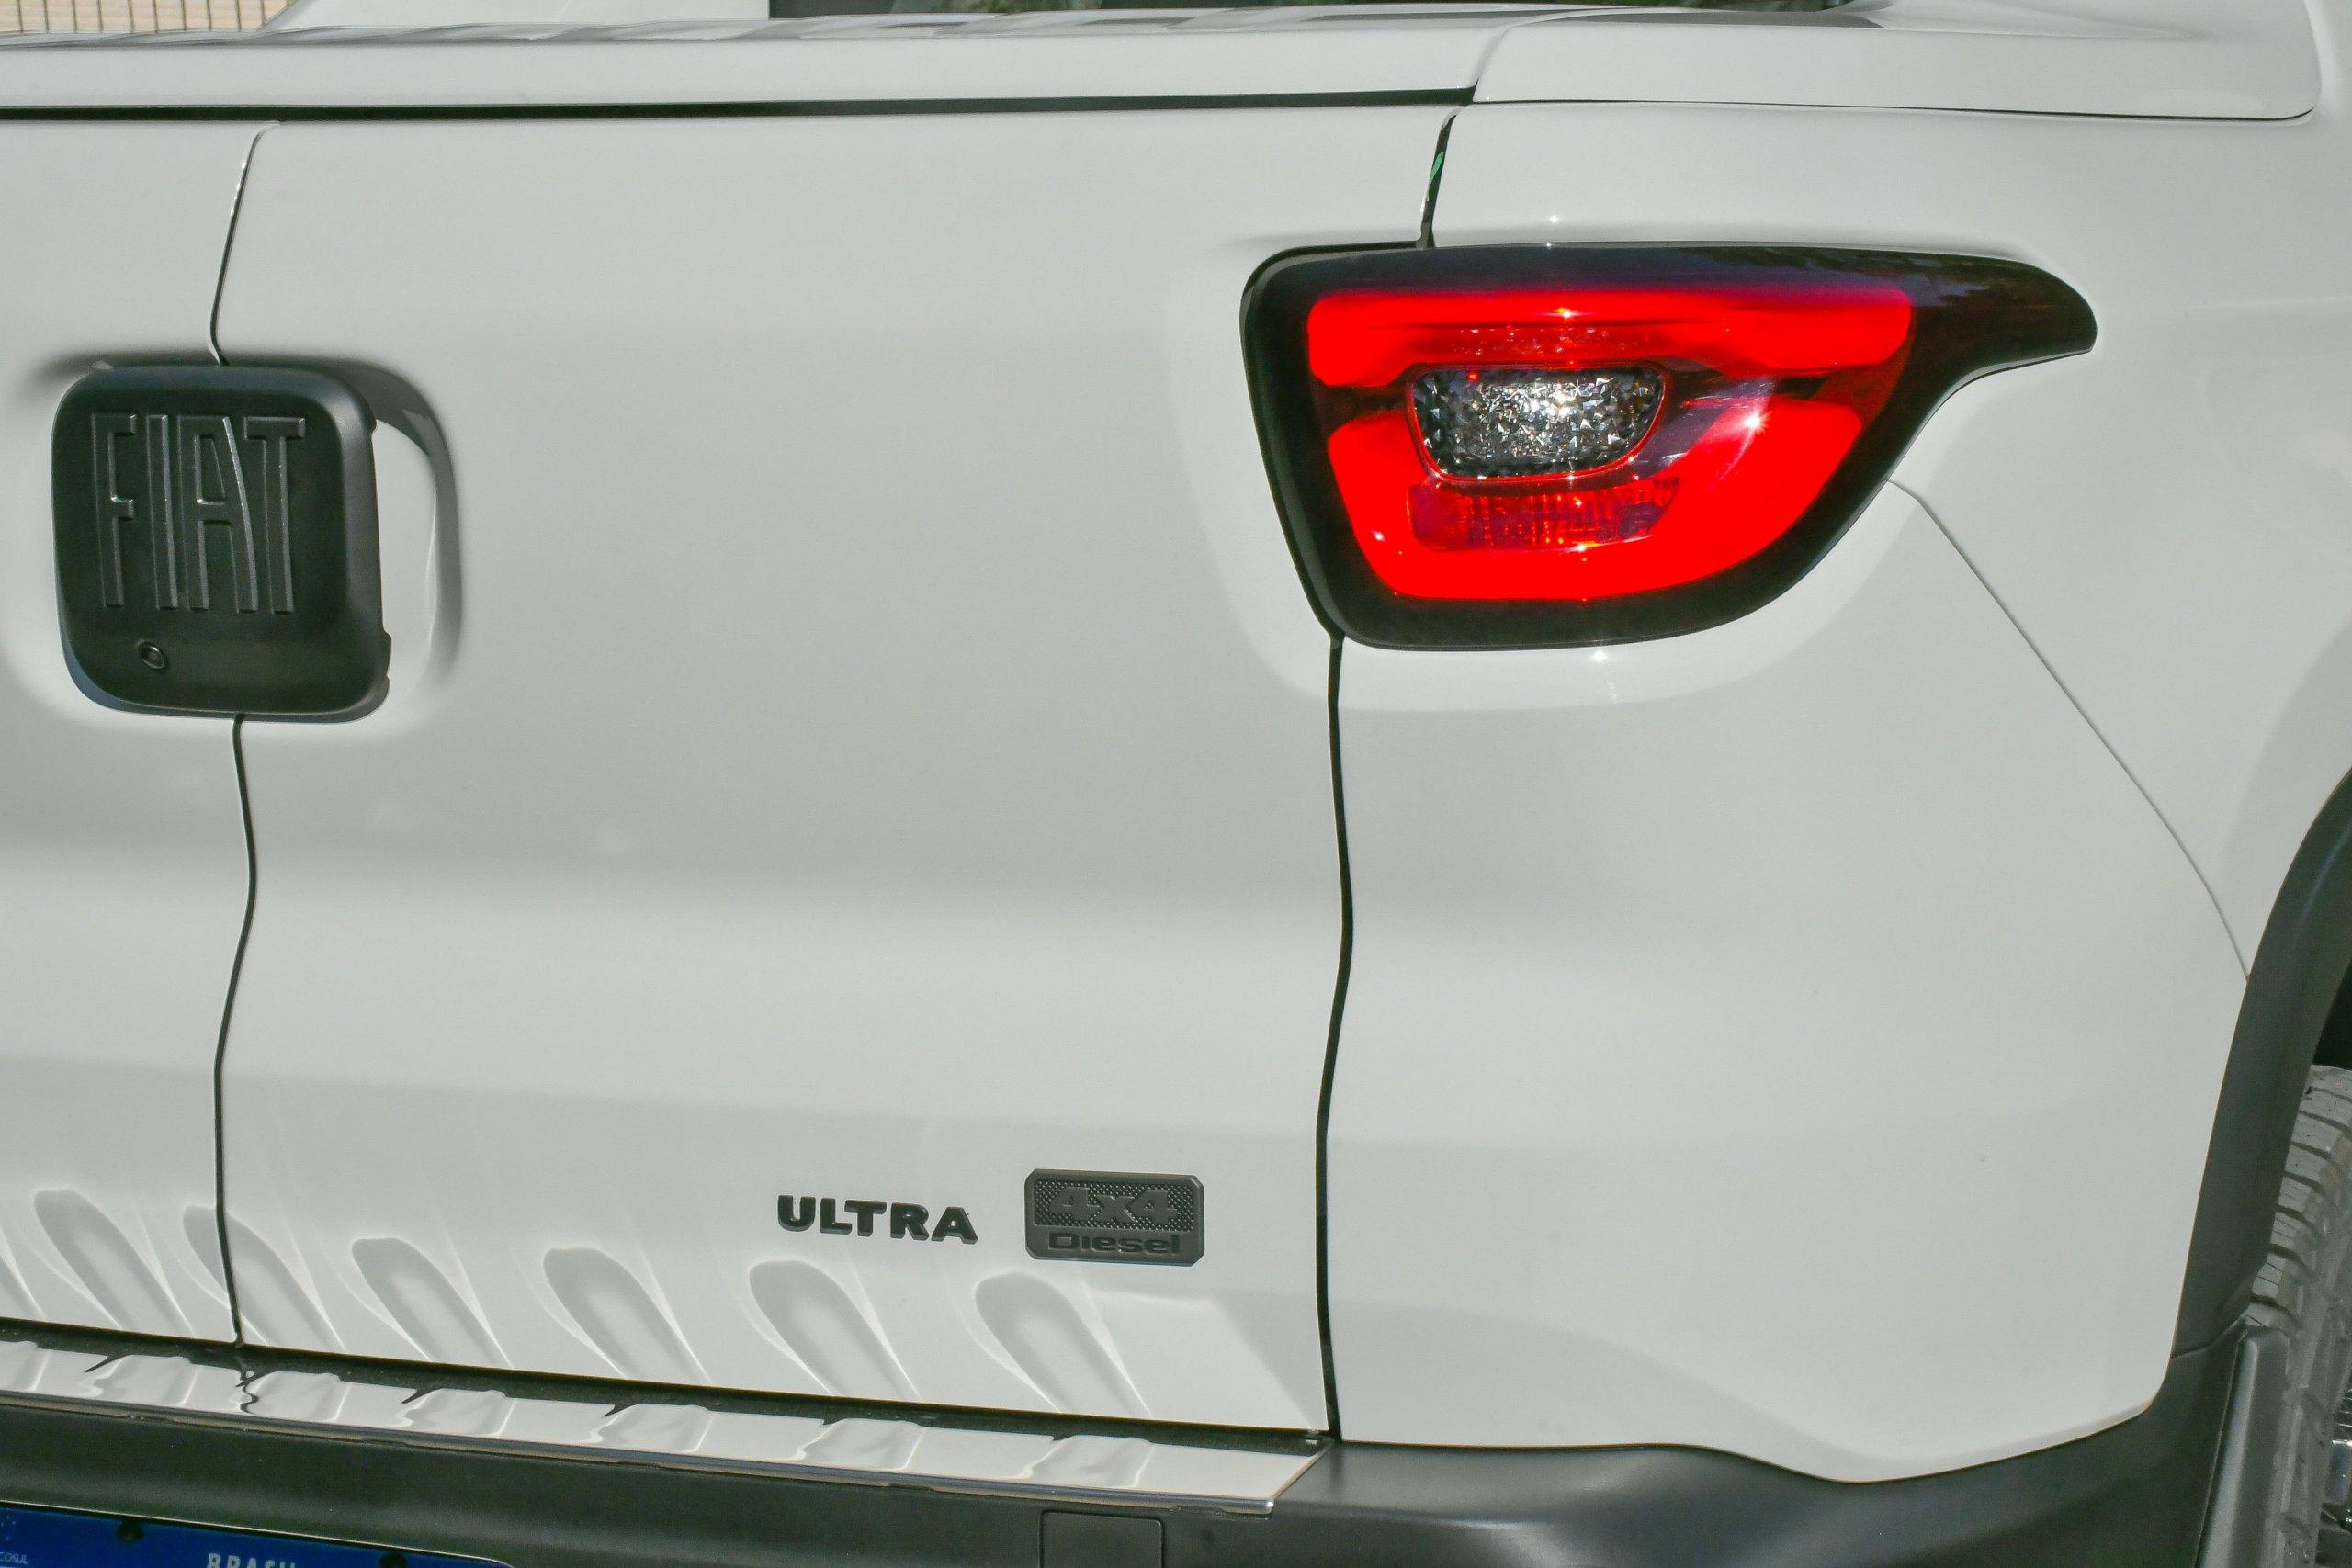 Fiat Toro Ultra T350 Diesel 2428